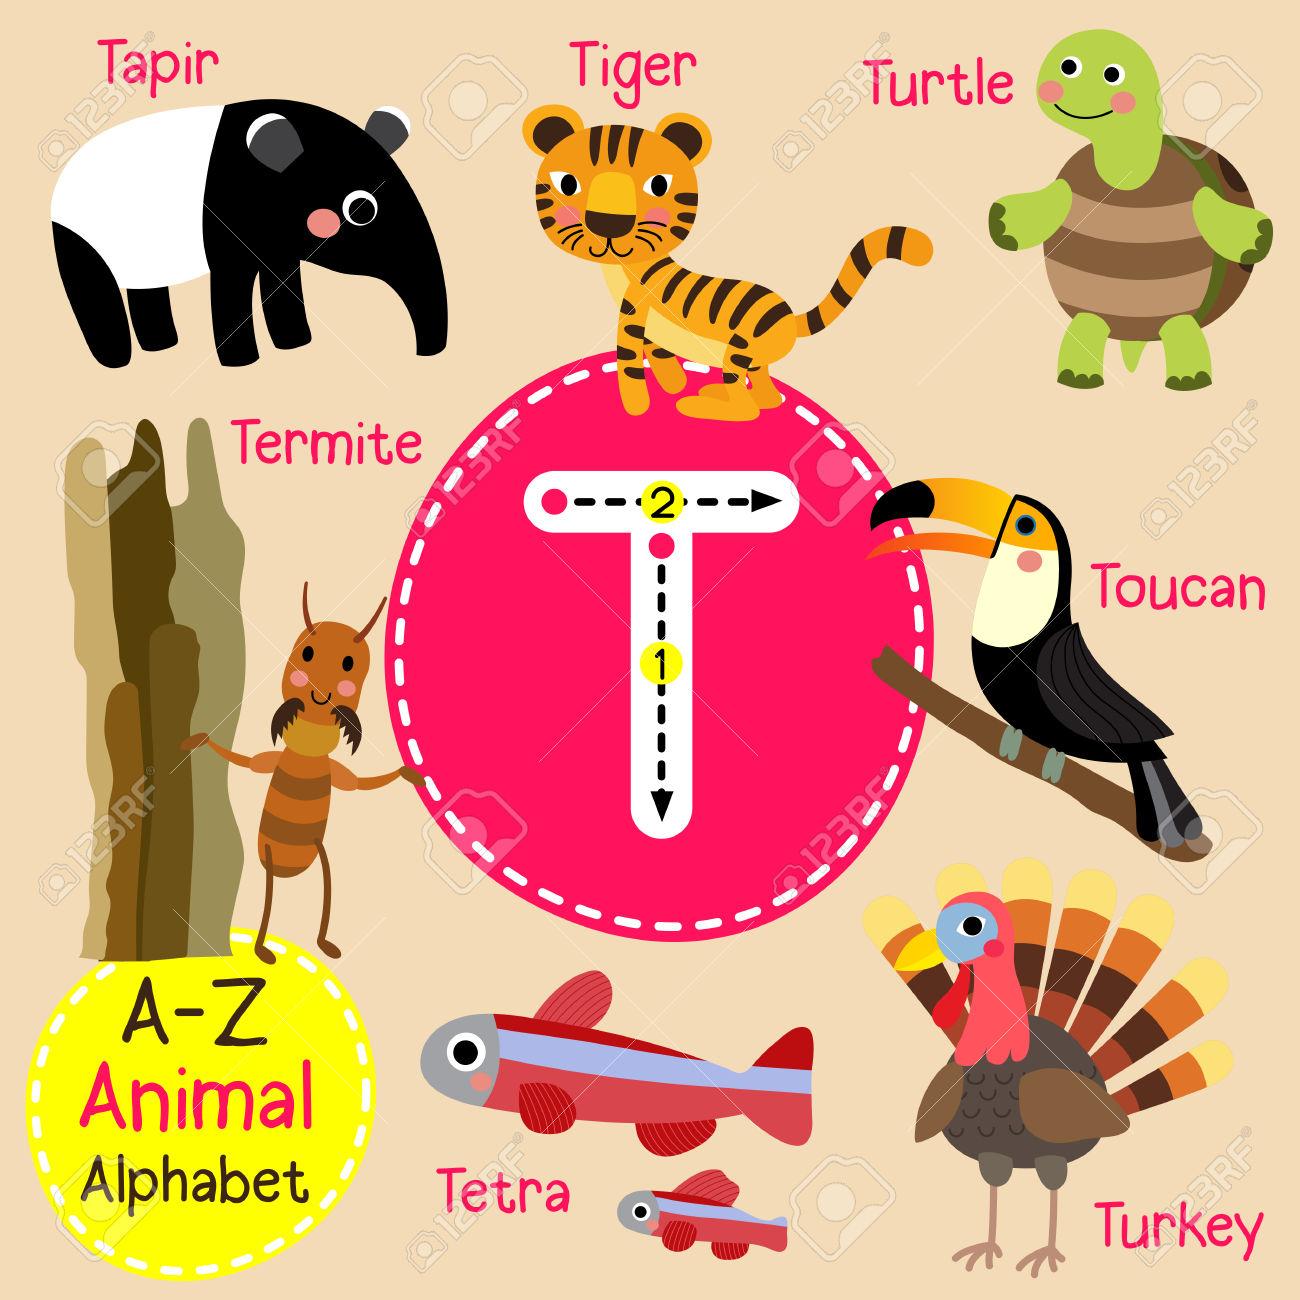 T Letter Tracing. Turtle. Toucan. Tiger. Termite. Tapir. Tetra.